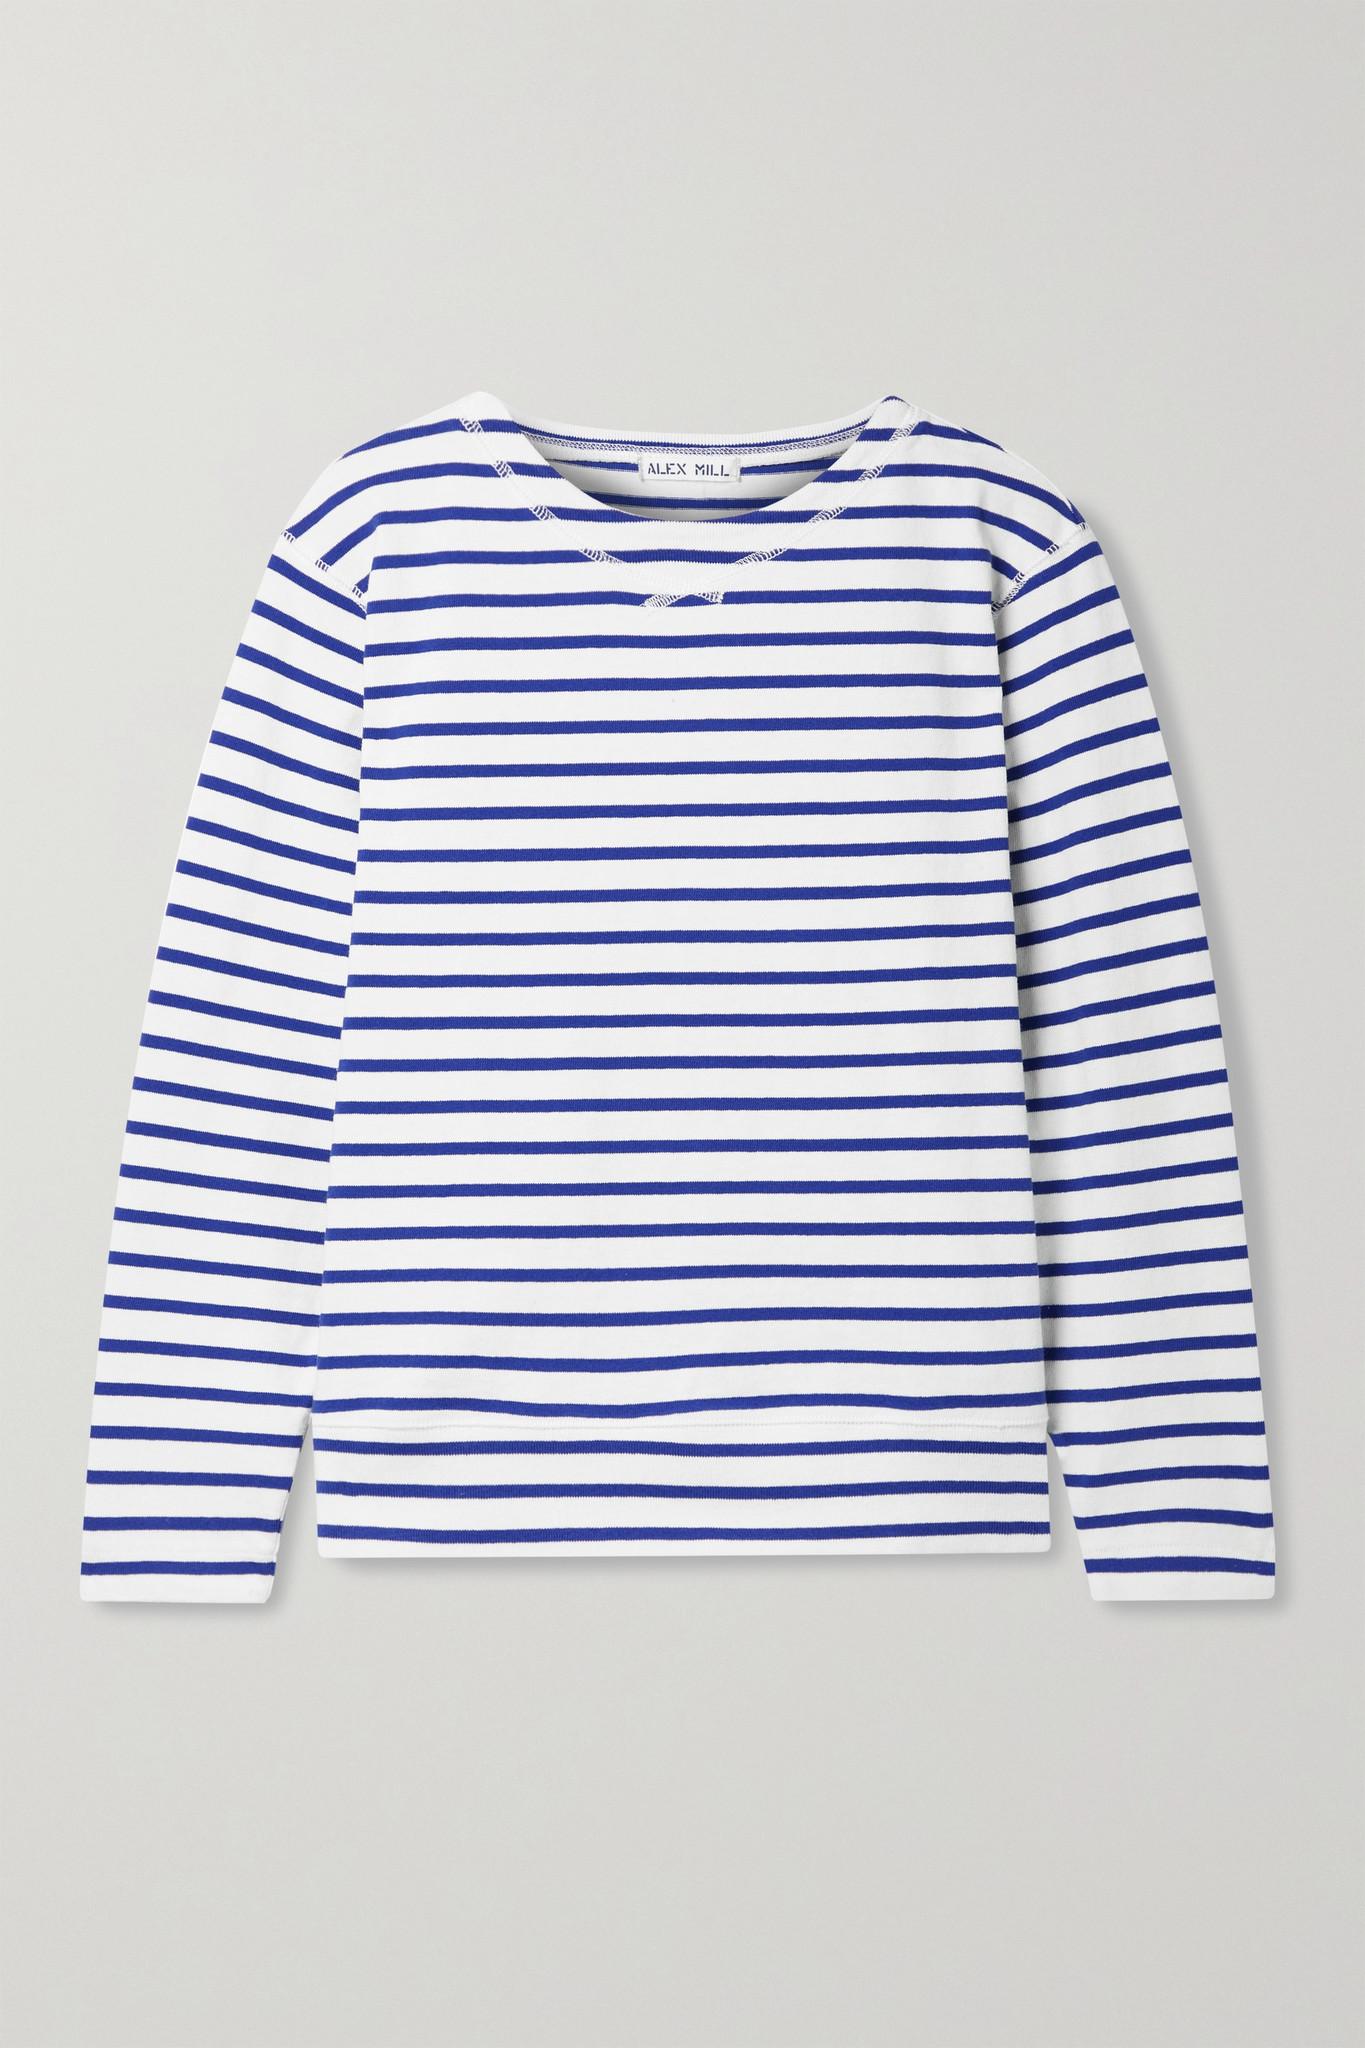 ALEX MILL - Lakeside 条纹纯棉平纹布上衣 - 白色 - small